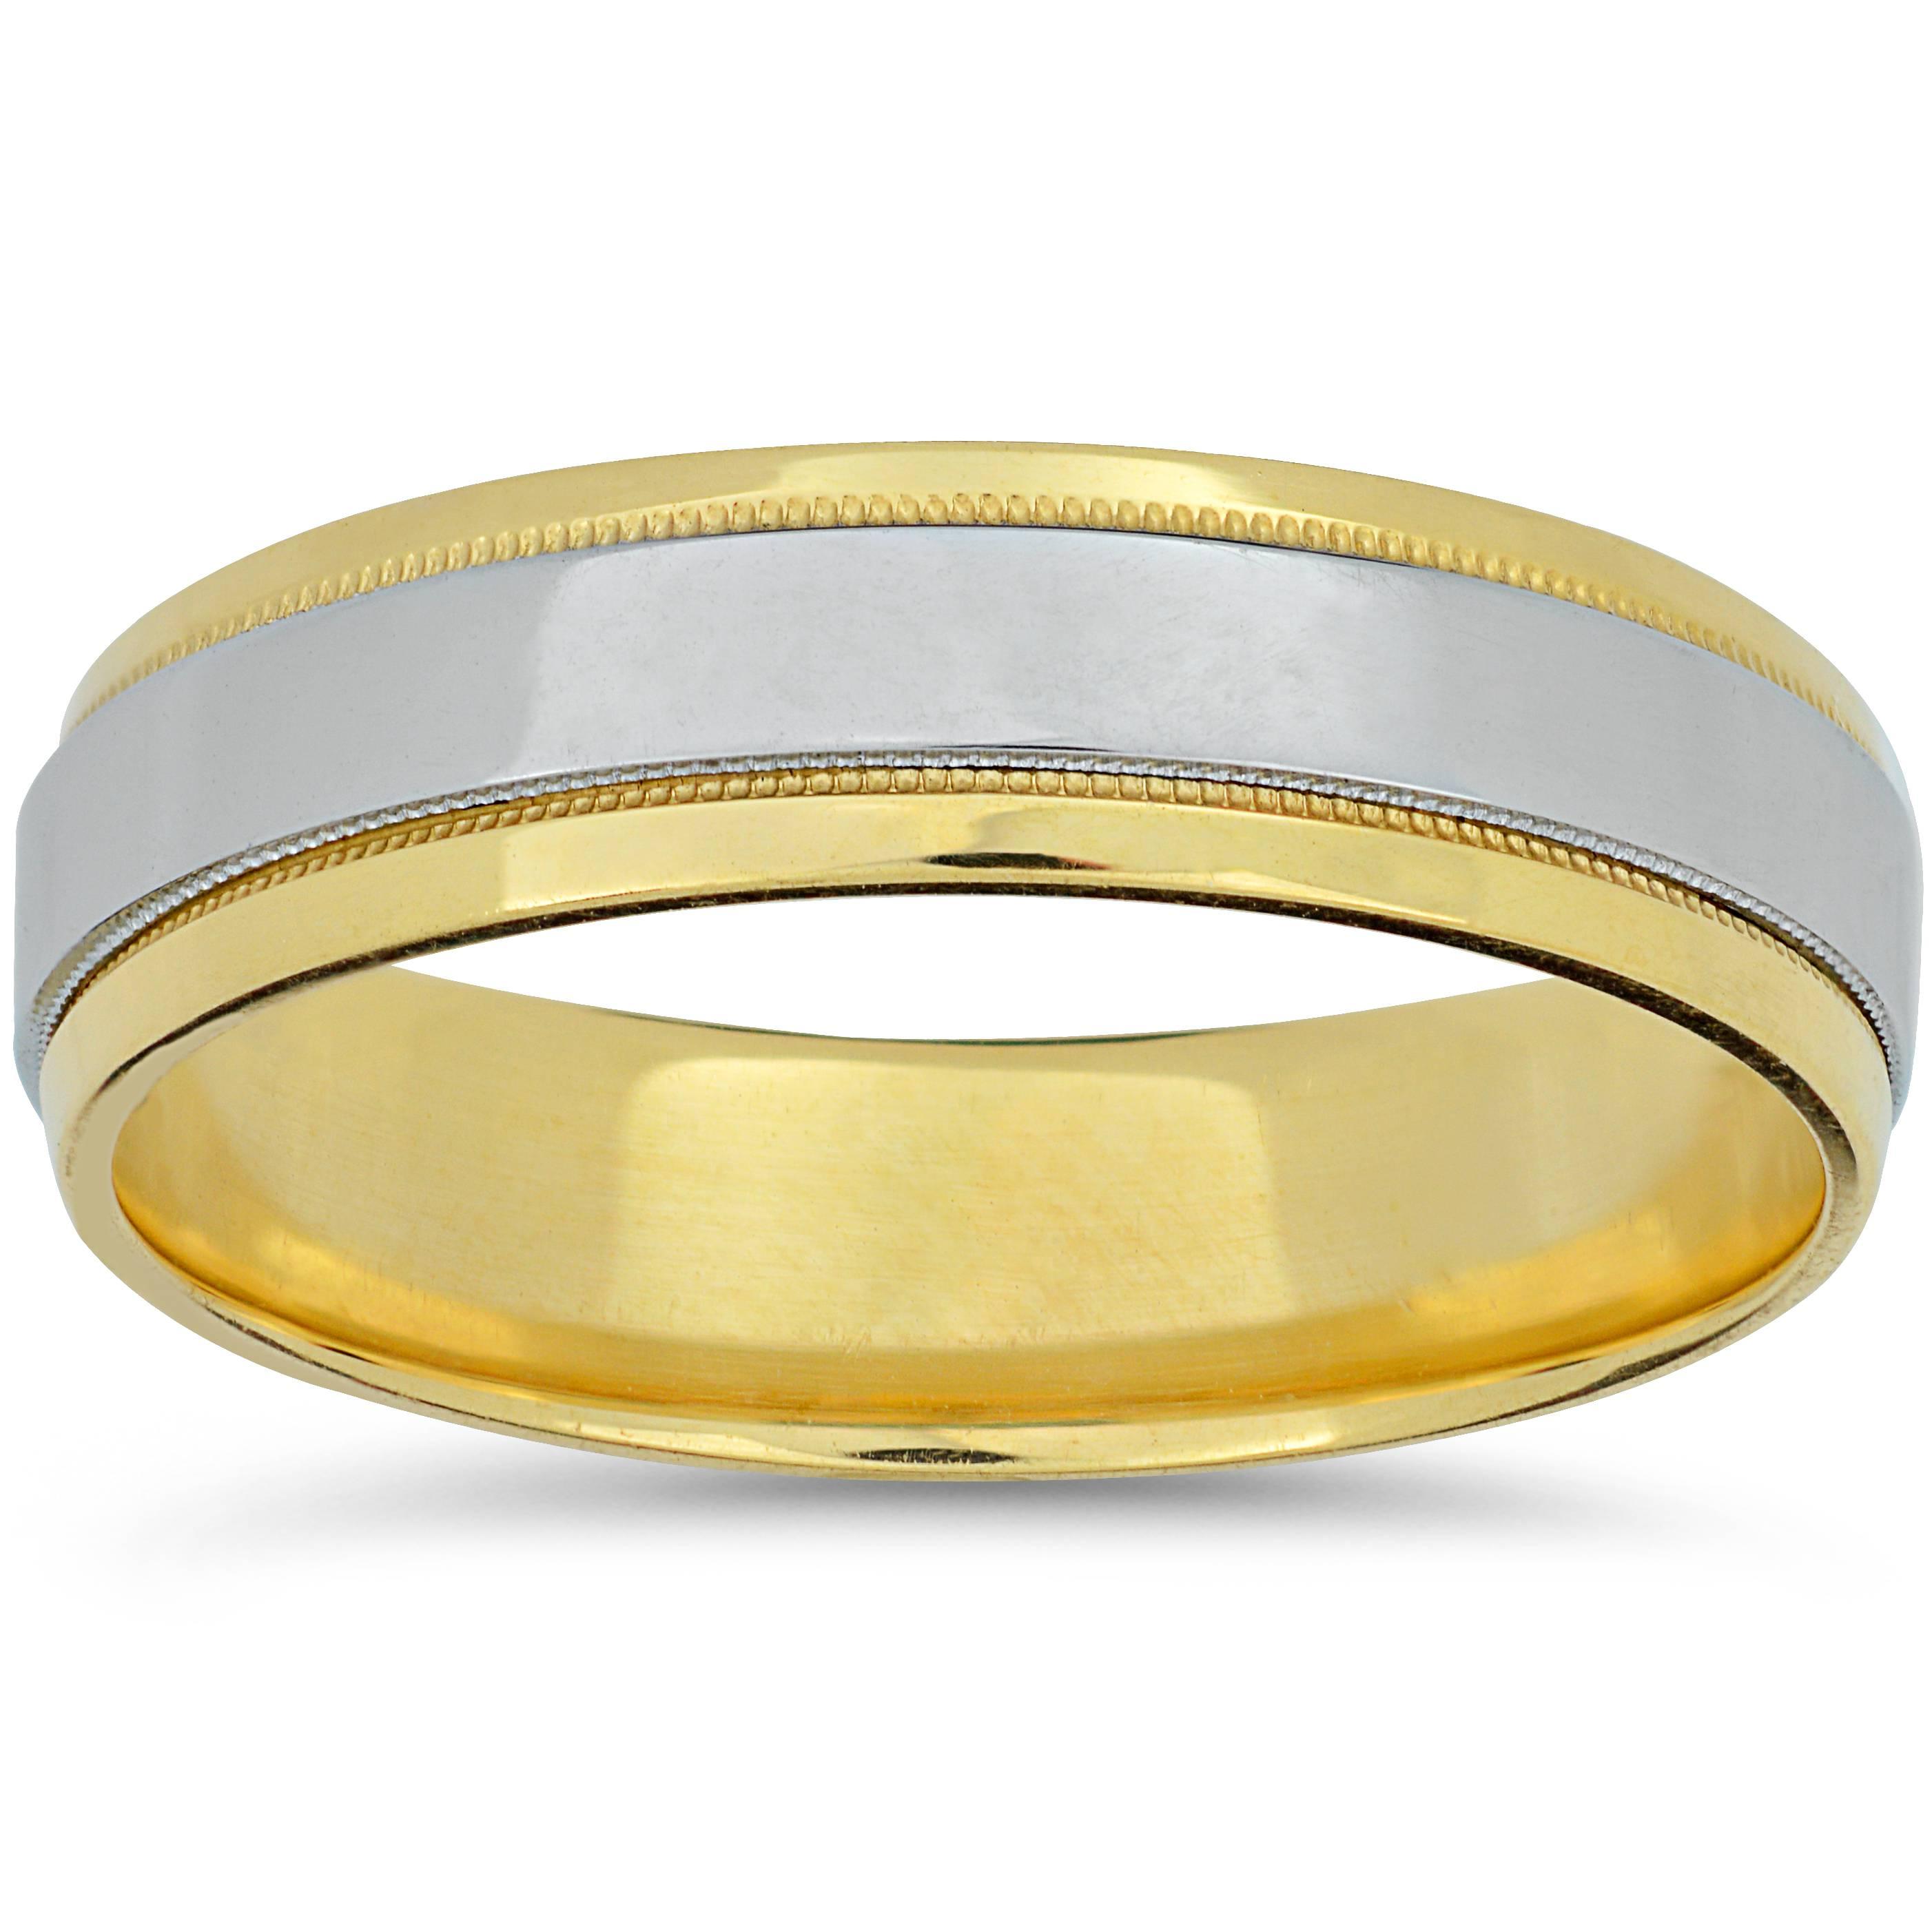 mens platinum 18k yellow gold two tone wedding band high. Black Bedroom Furniture Sets. Home Design Ideas